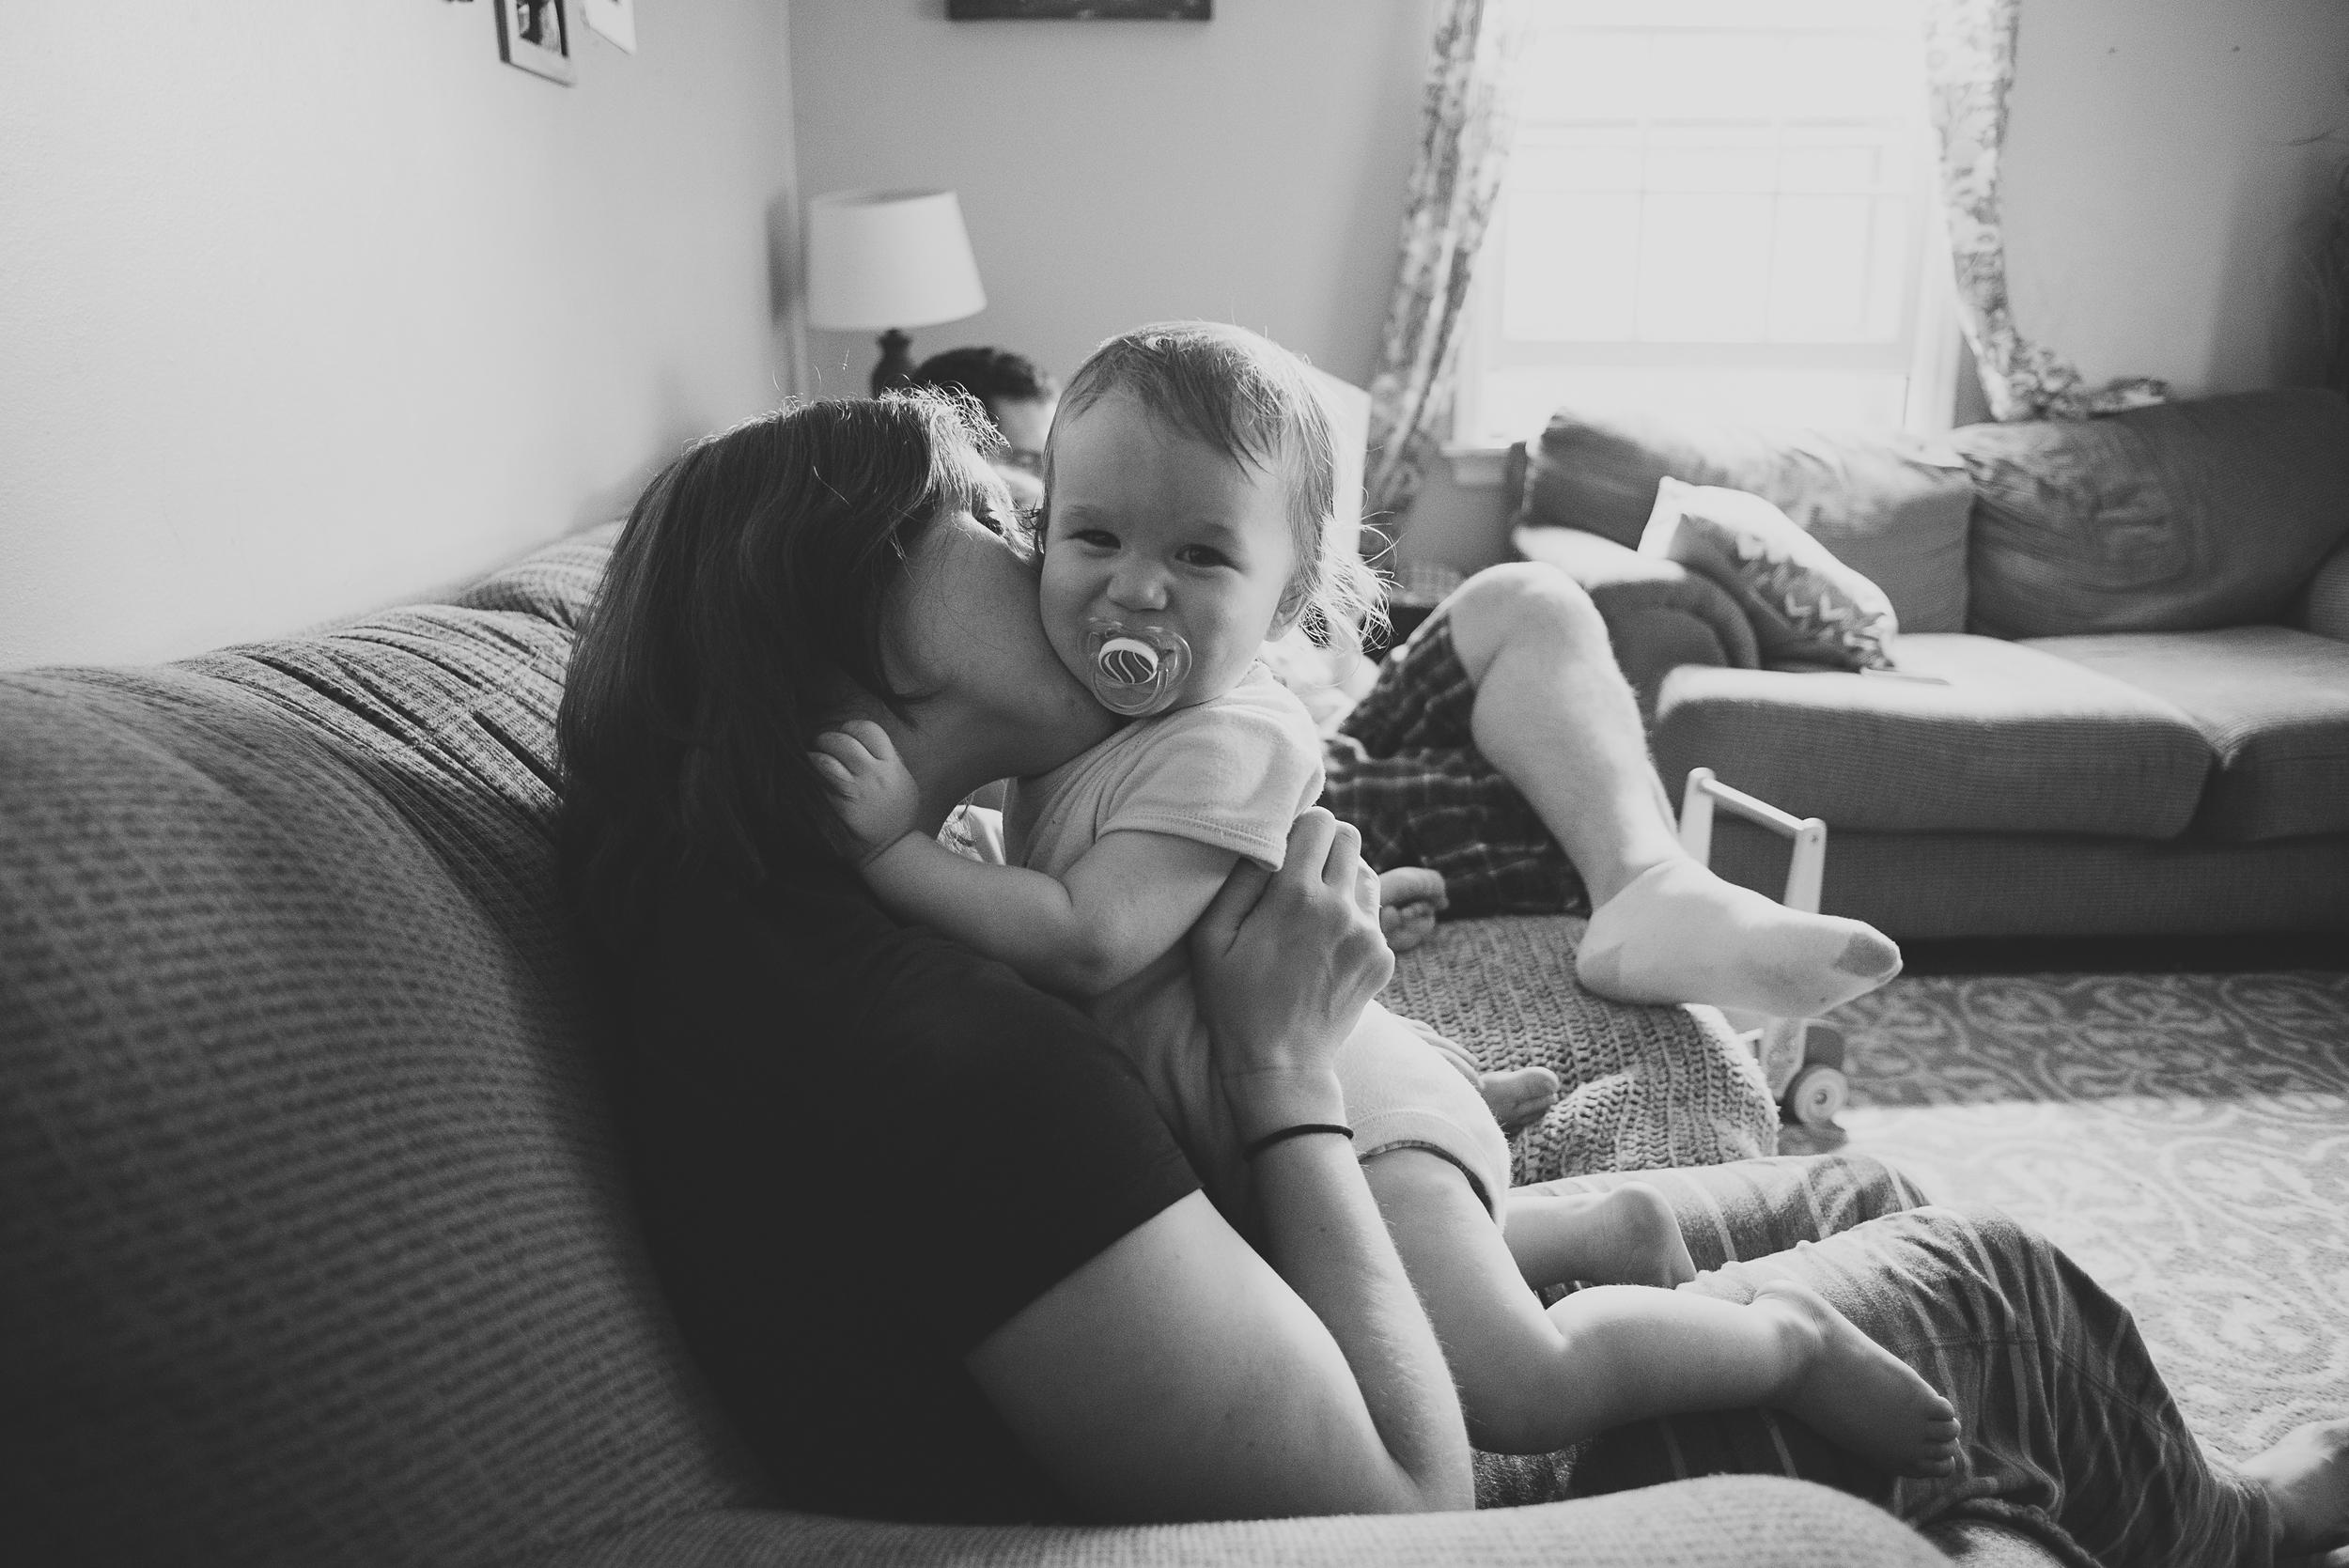 dan-jess-family-on-sofa-5.jpg